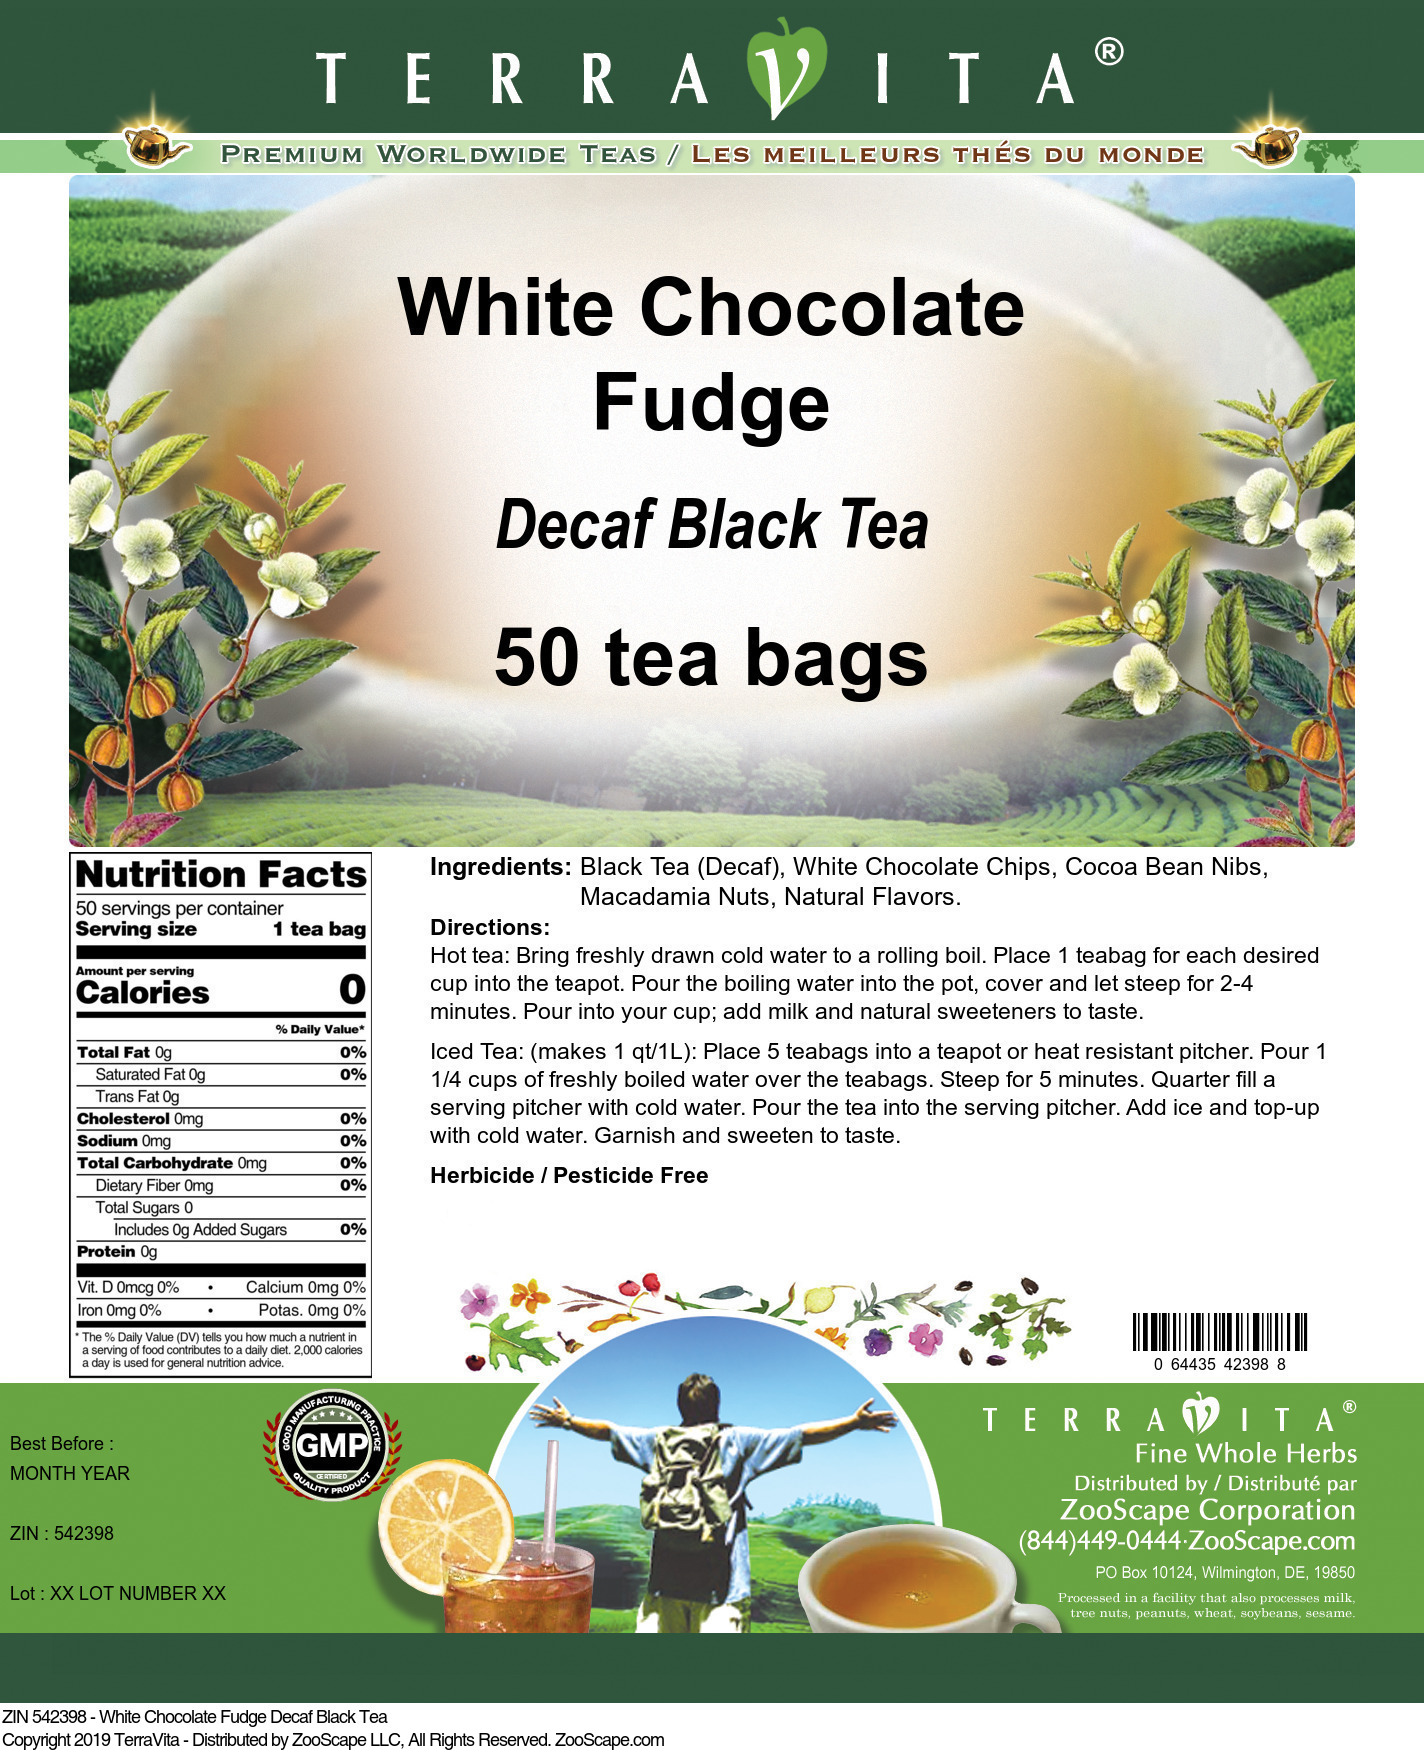 White Chocolate Fudge Decaf Black Tea